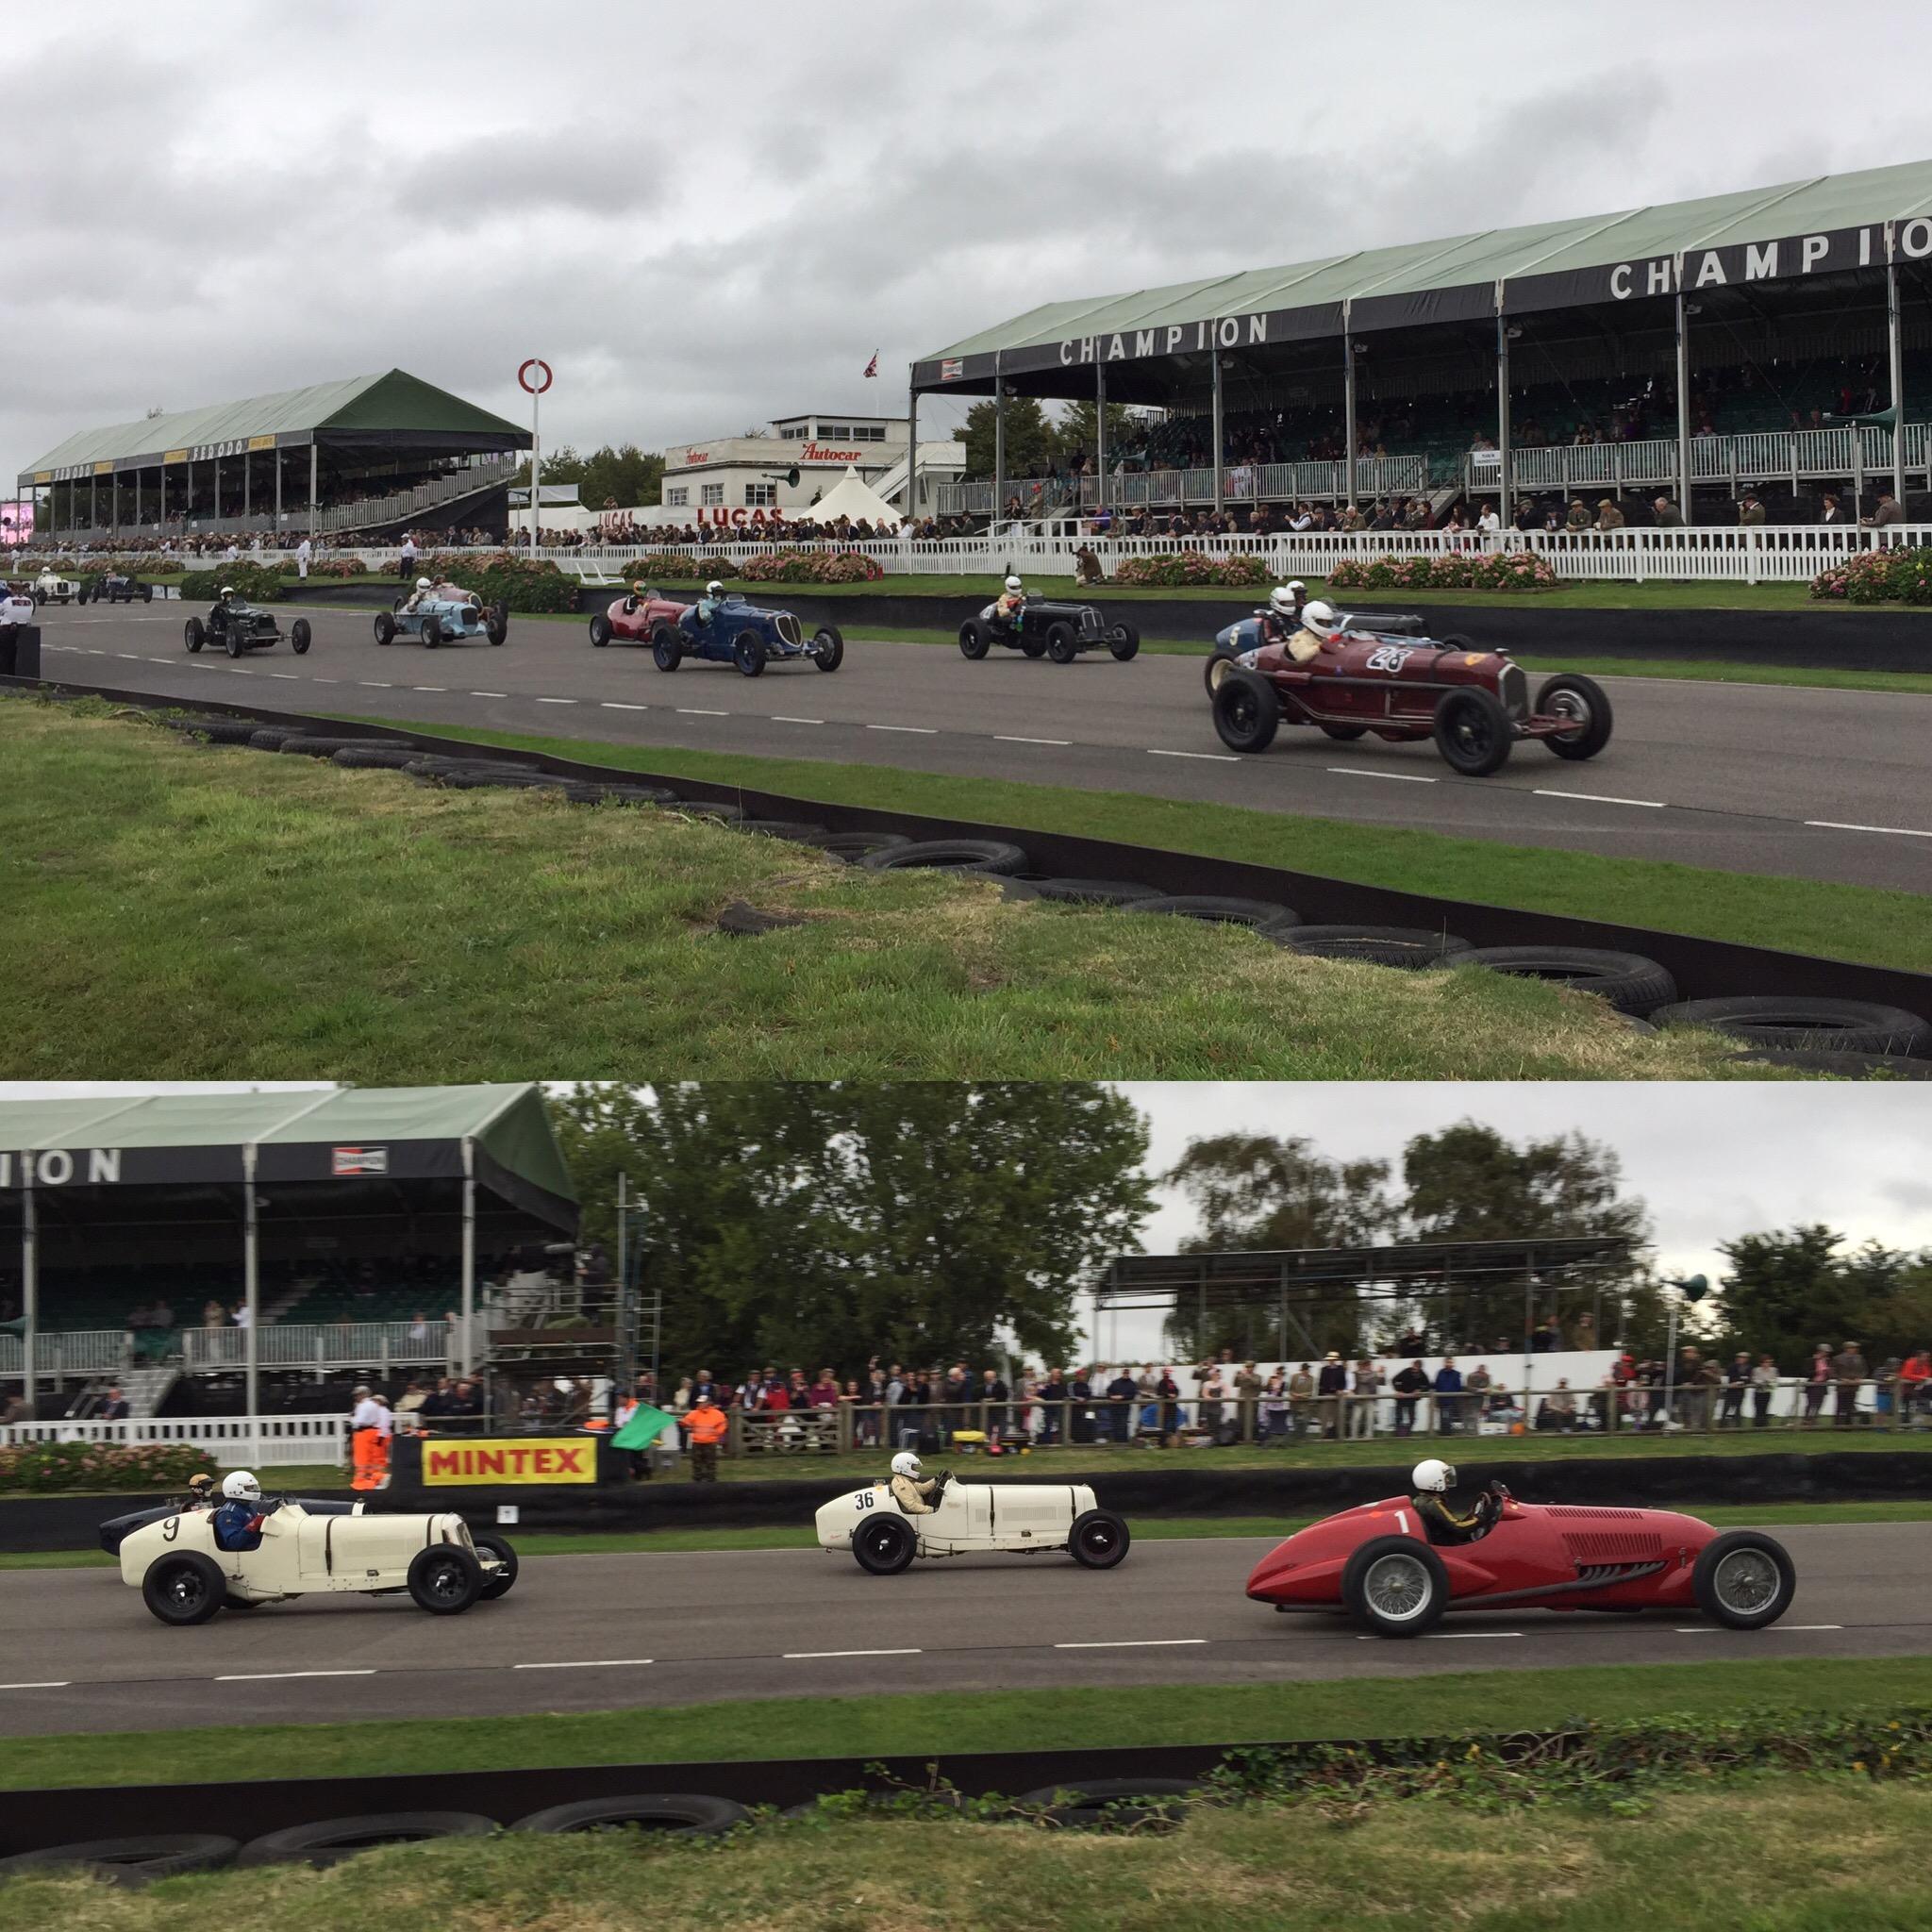 2016 Goodwood Revival Vintage Race Cars